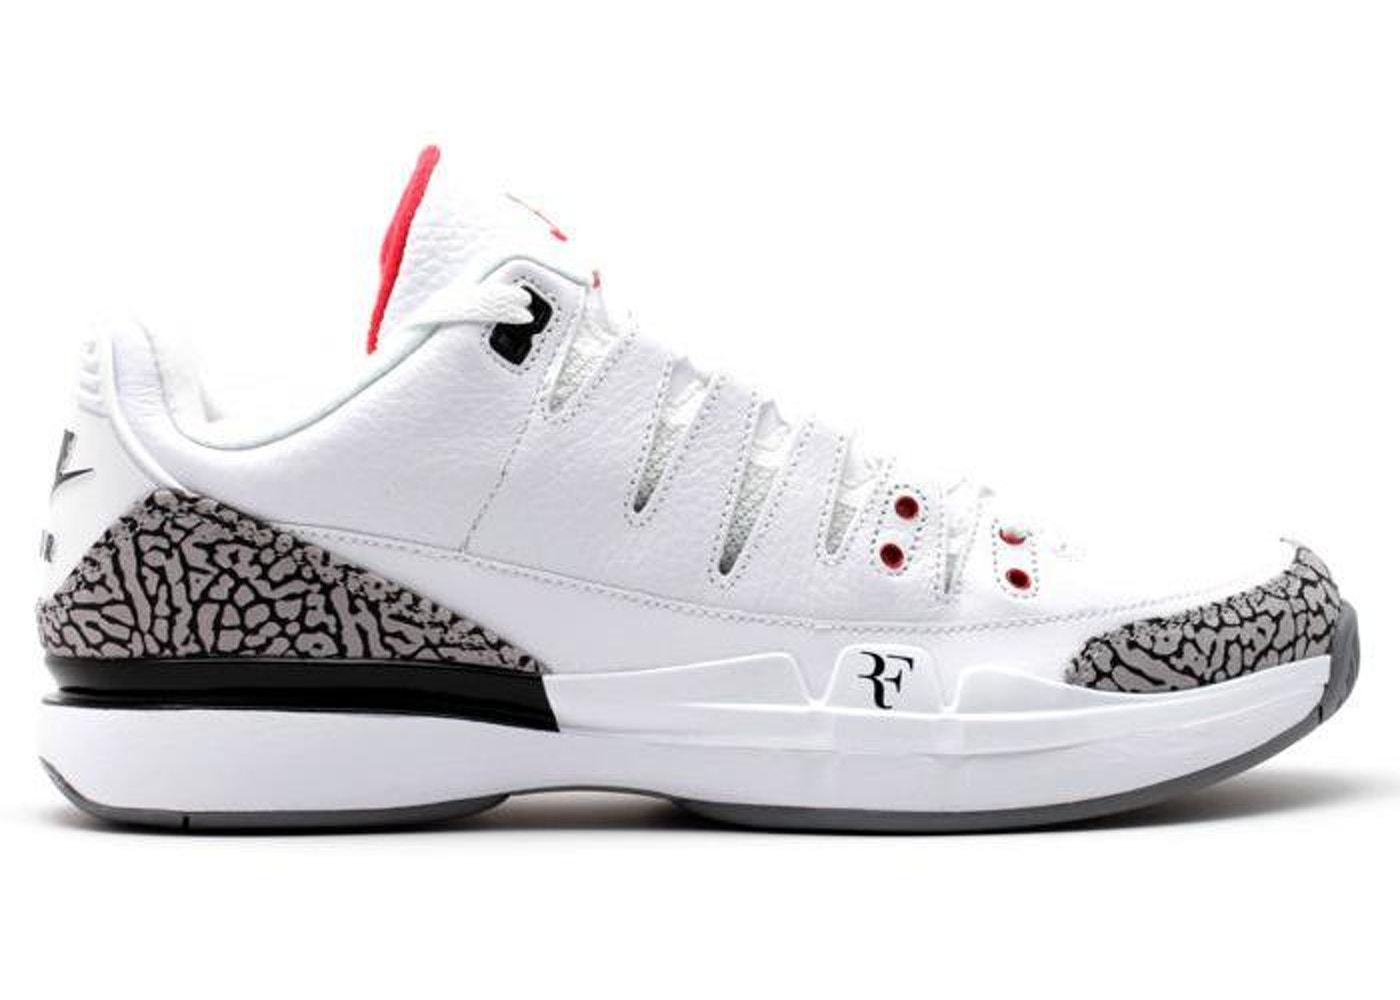 hot sale online 8814e 566ee Nike Zoom Vapor AJ3 White Cement - 709998-160